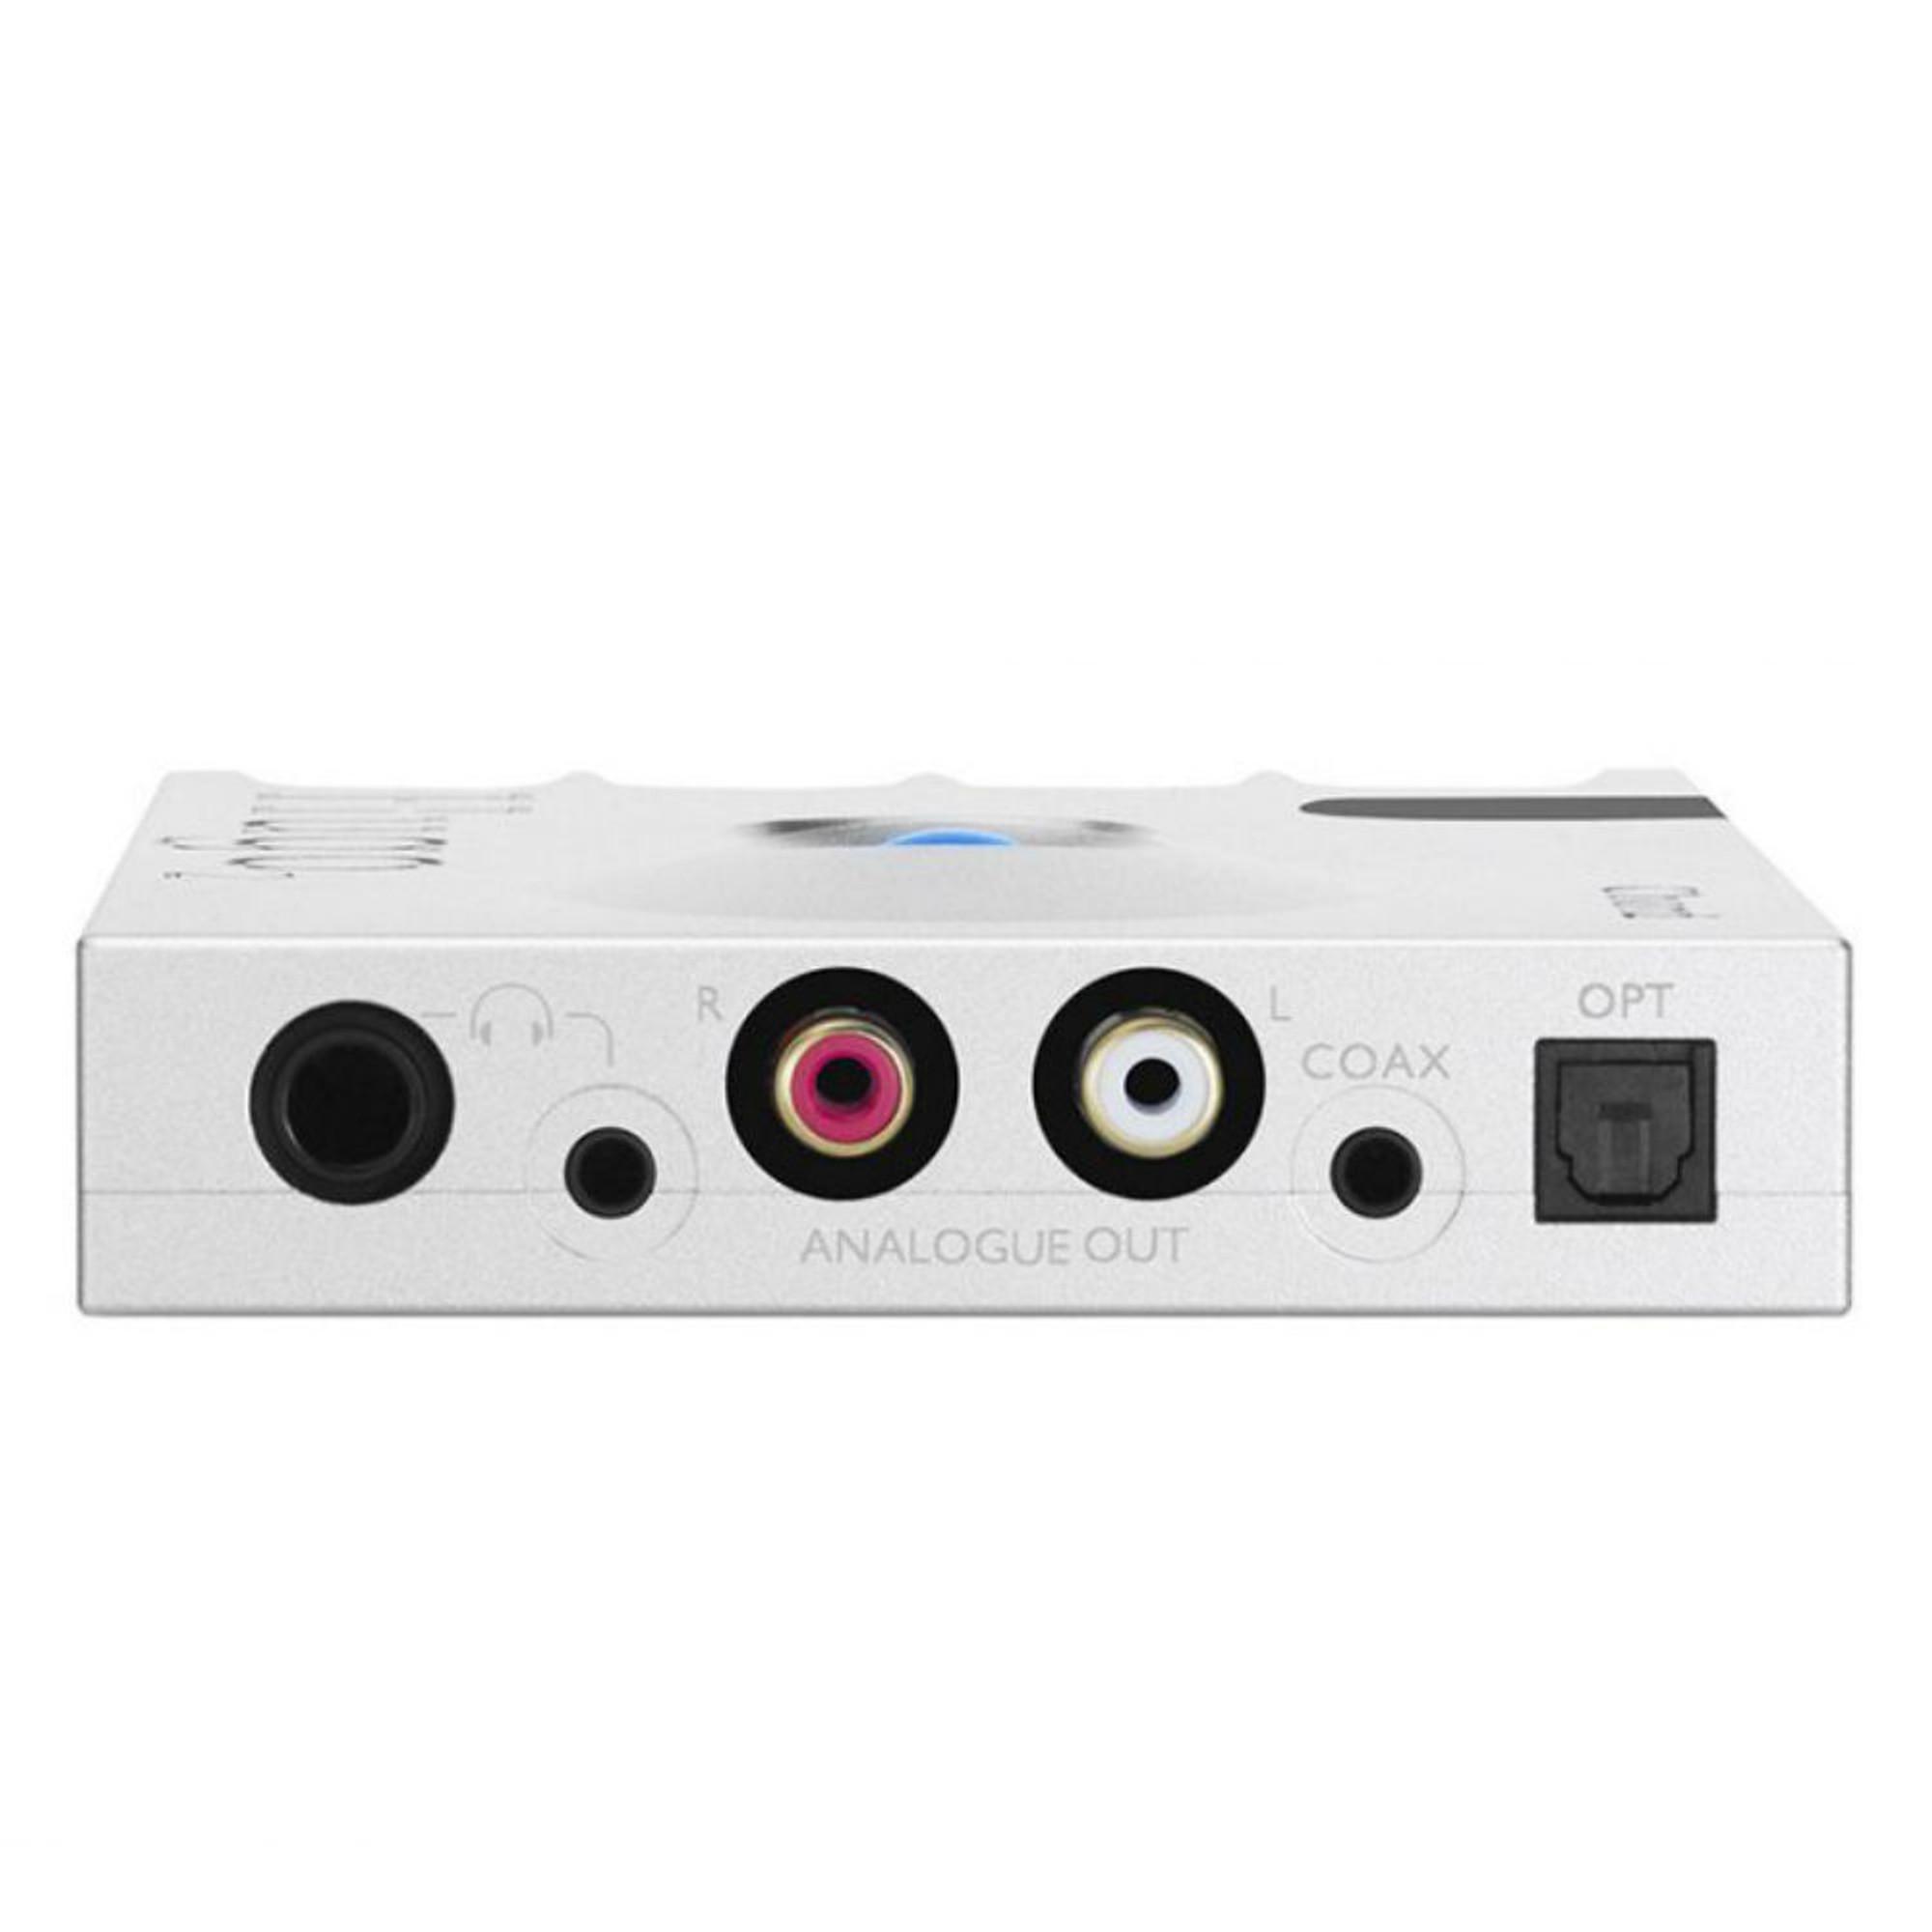 Chord Hugo 2 Portable DAC & Headphone Amplifier